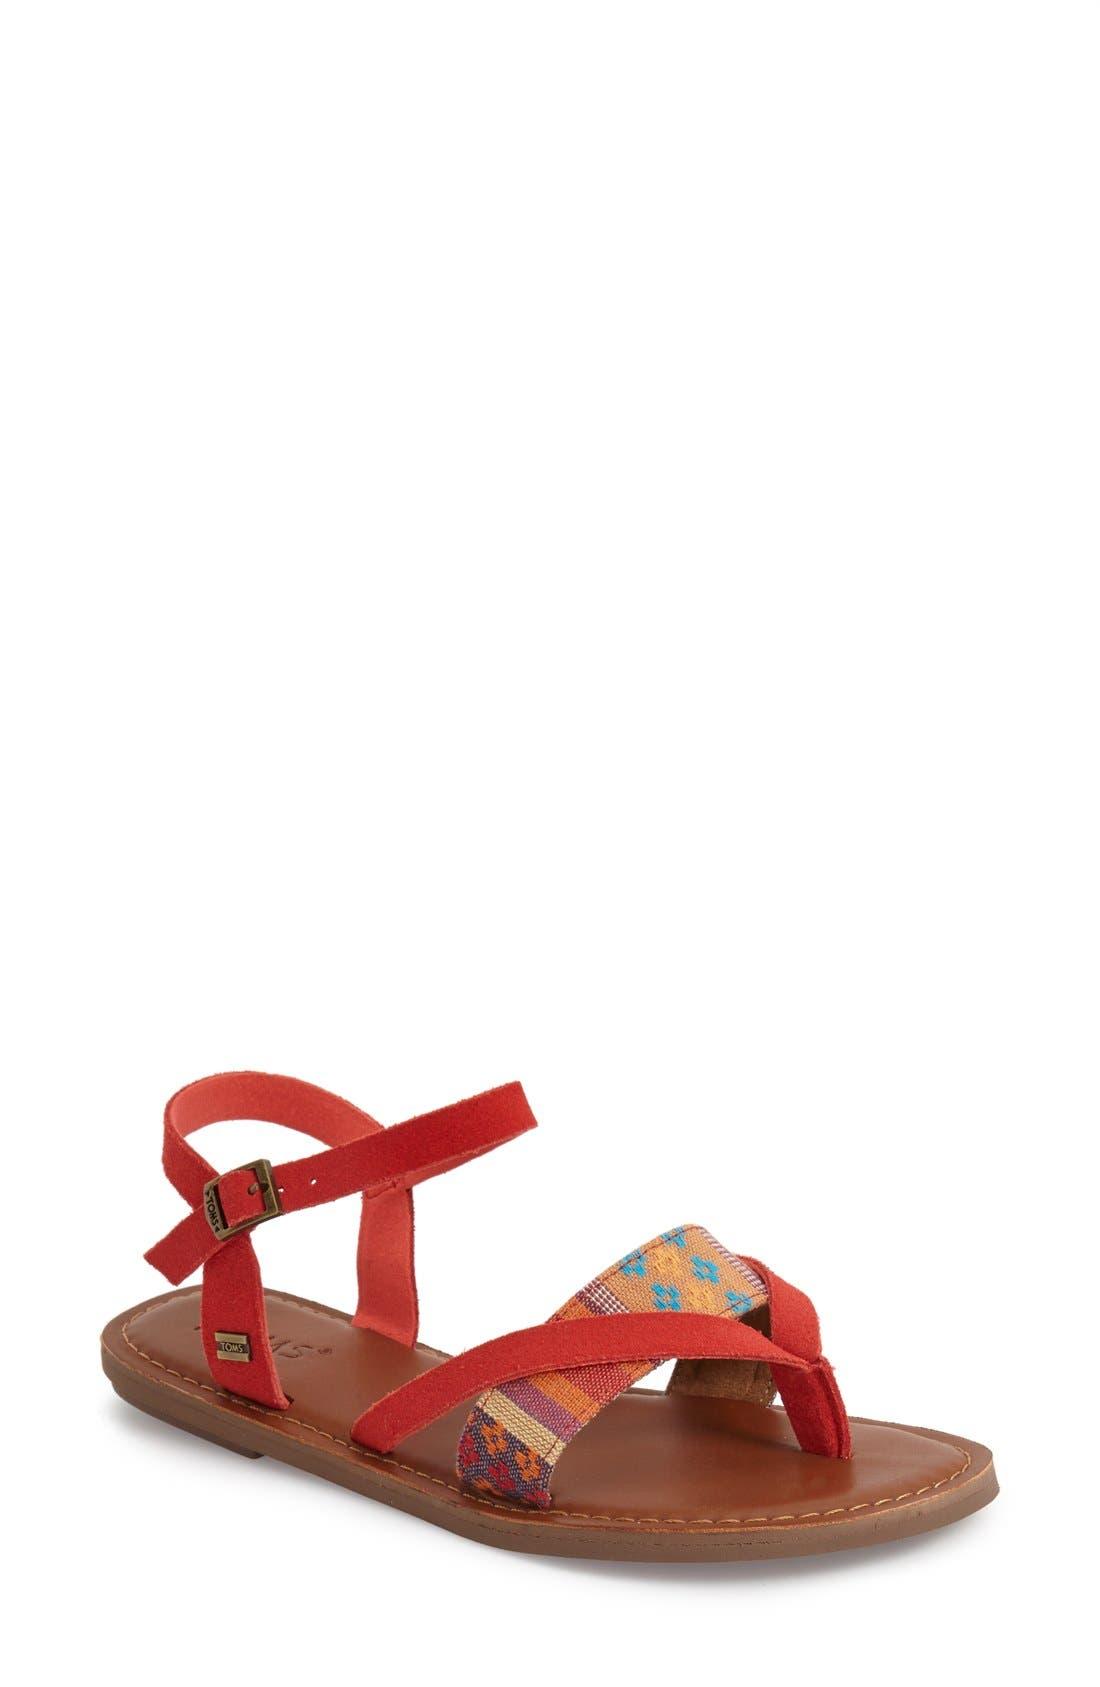 'Lexie' Sandal,                             Main thumbnail 13, color,